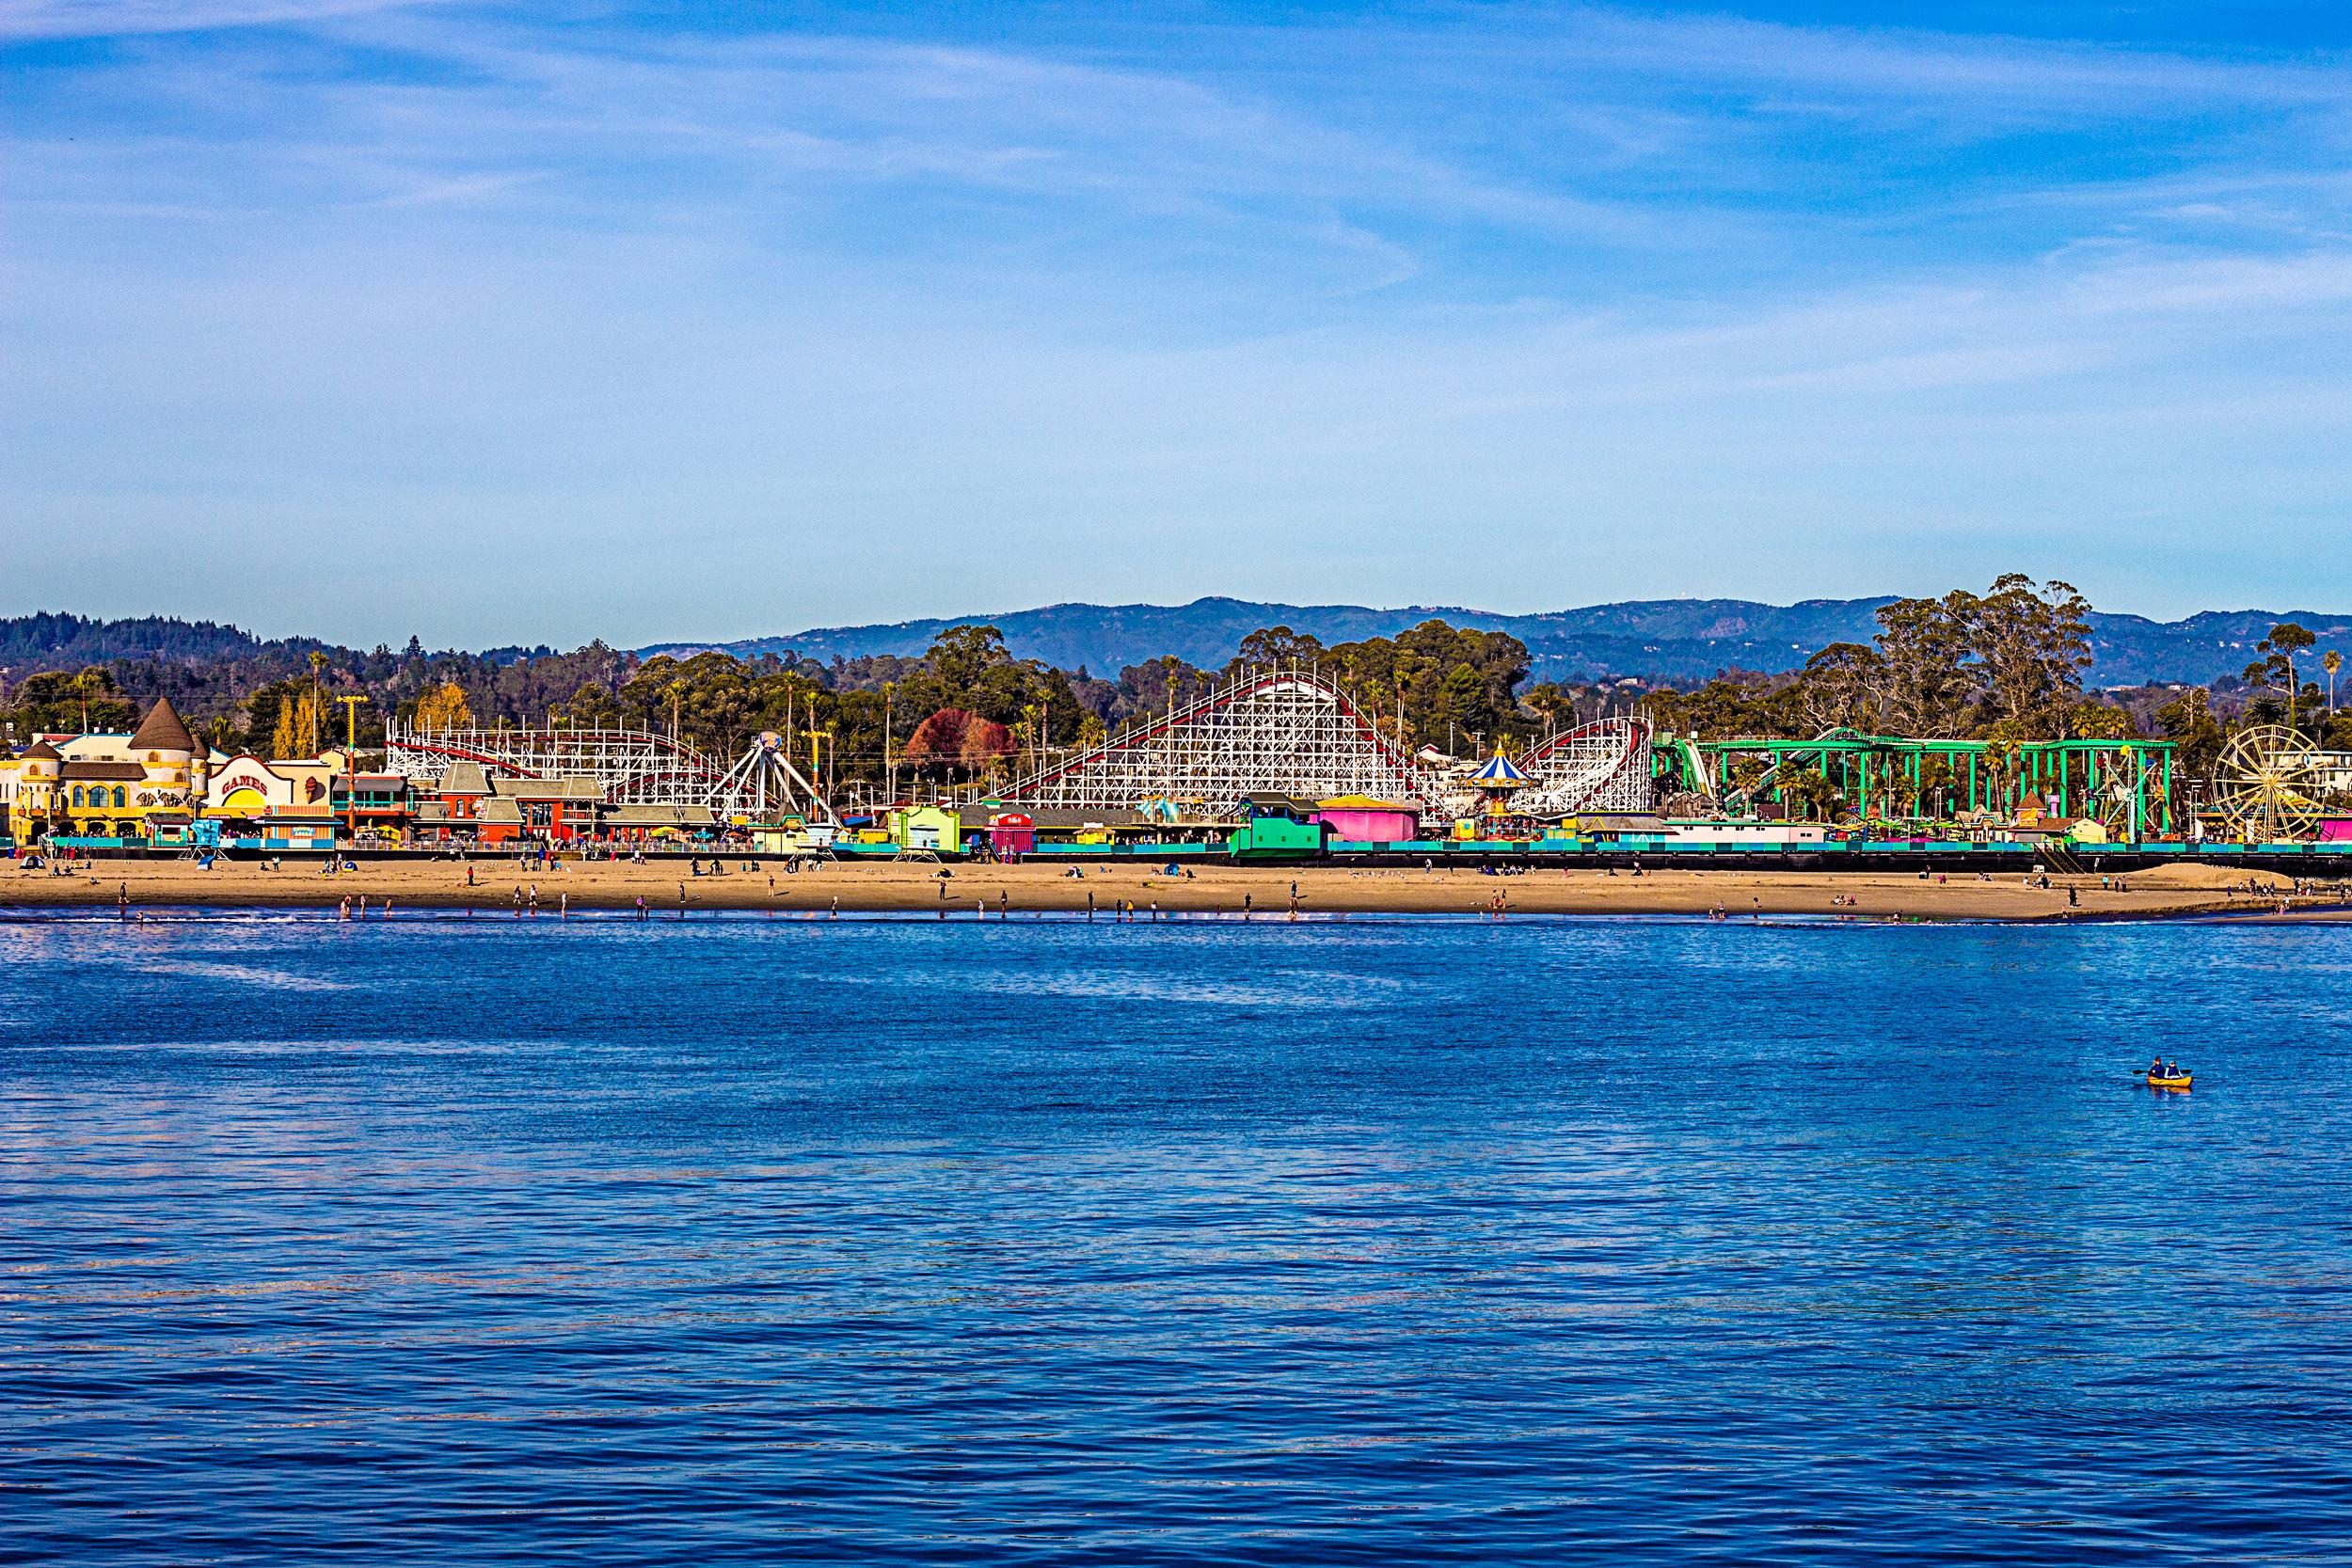 Santa-Cruz-Boardwalk.jpg